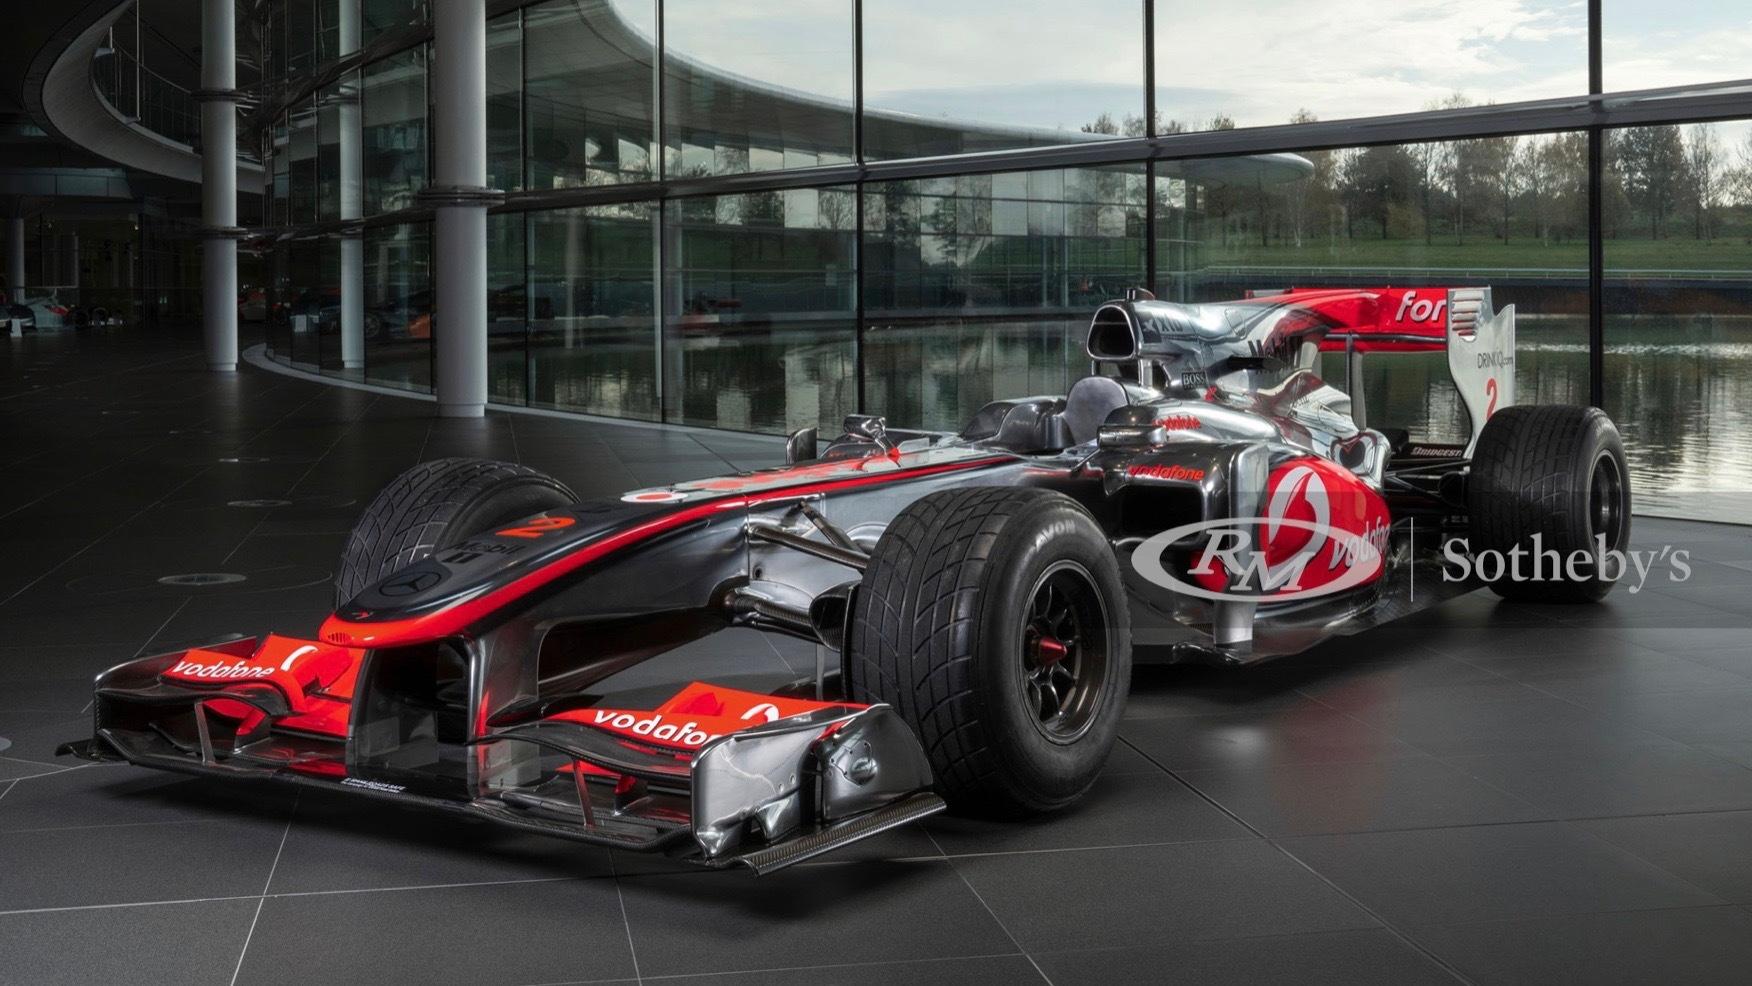 2010 McLaren-Mercedes MP4-25A Formula One car driven by Lewis Hamilton (Photo by RM Sotheby's)